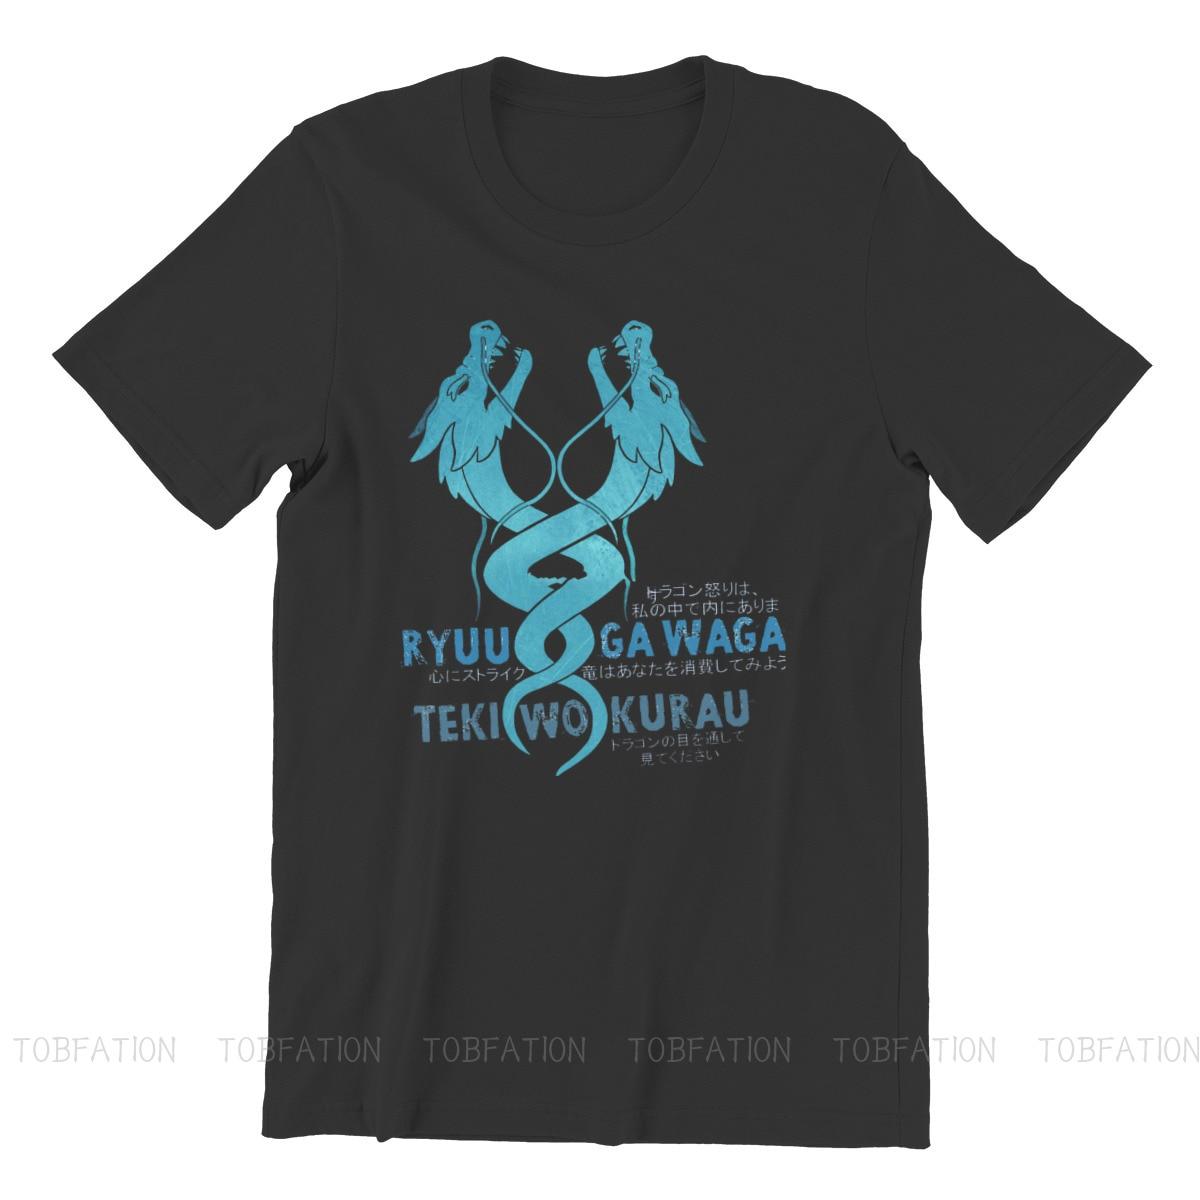 Ryuu Ga Waga Teki Wo Kurau Round Collar TShirt Overwatch Pure Cotton Basic T Shirt Man's Tops Fashion Oversized 3